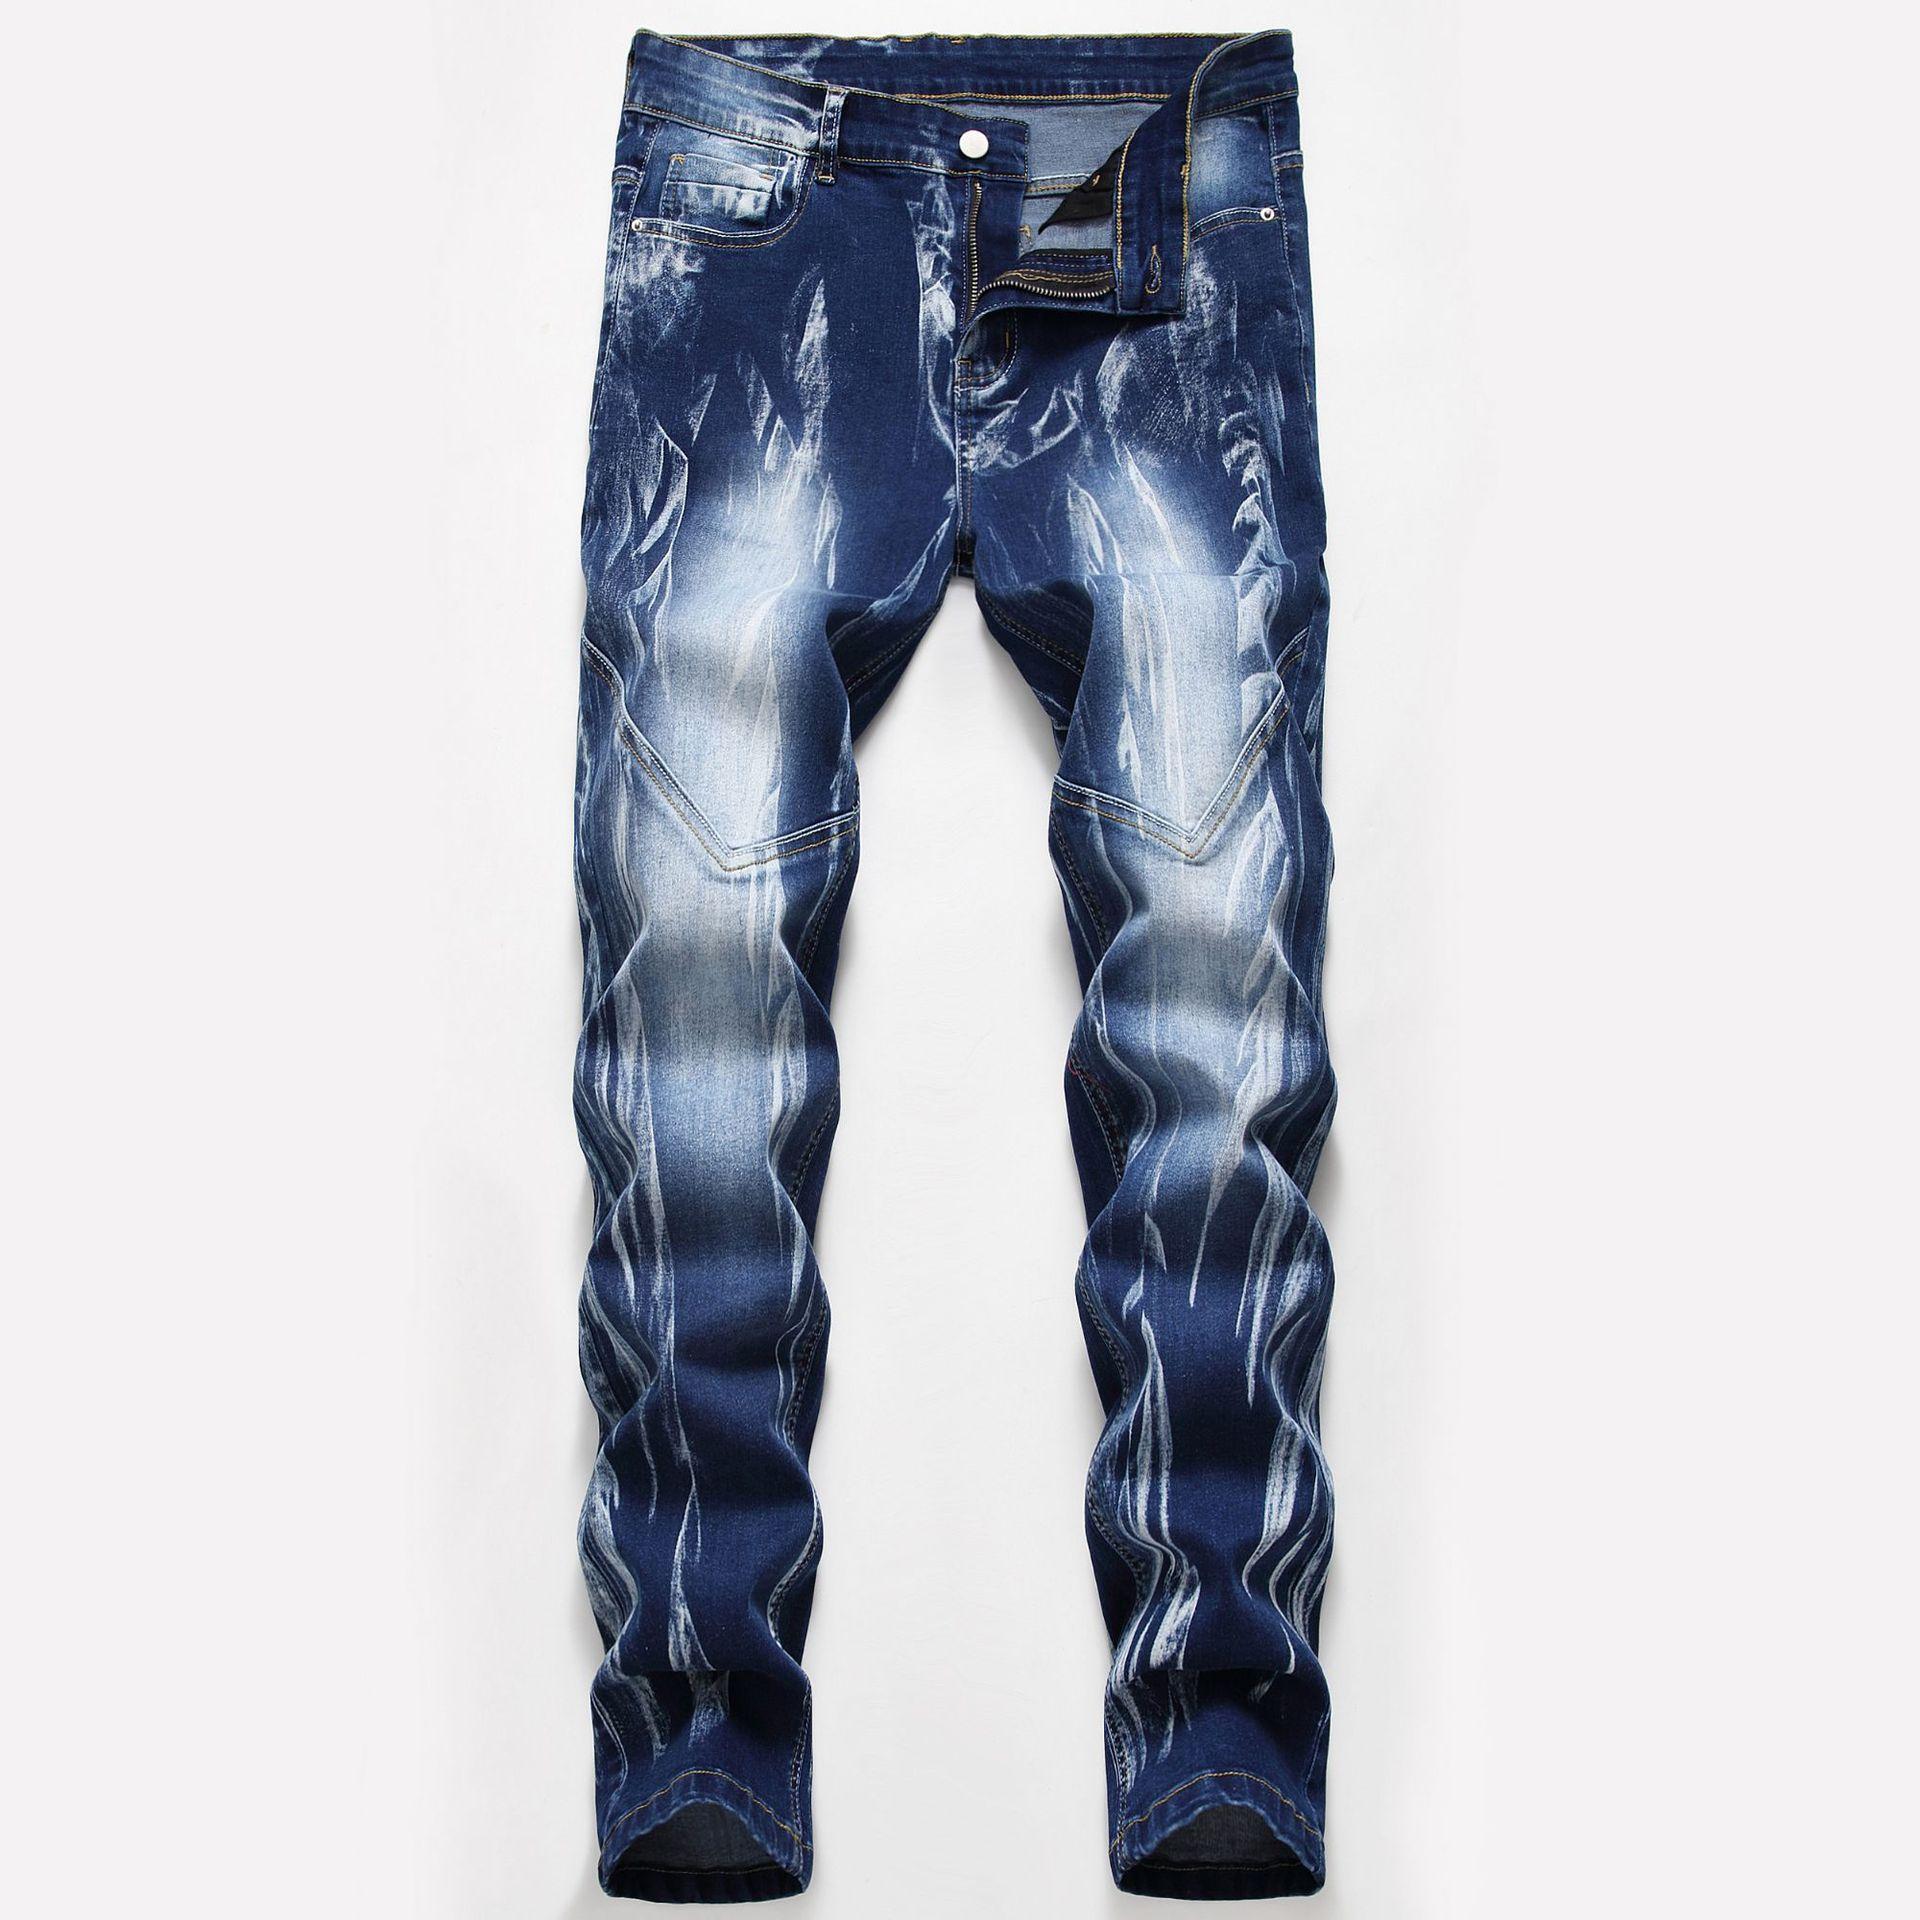 2020 High Quality Men Casual Jeans Coated Slim Jeans Pants Male Denim Casual Pants Plus Size 42